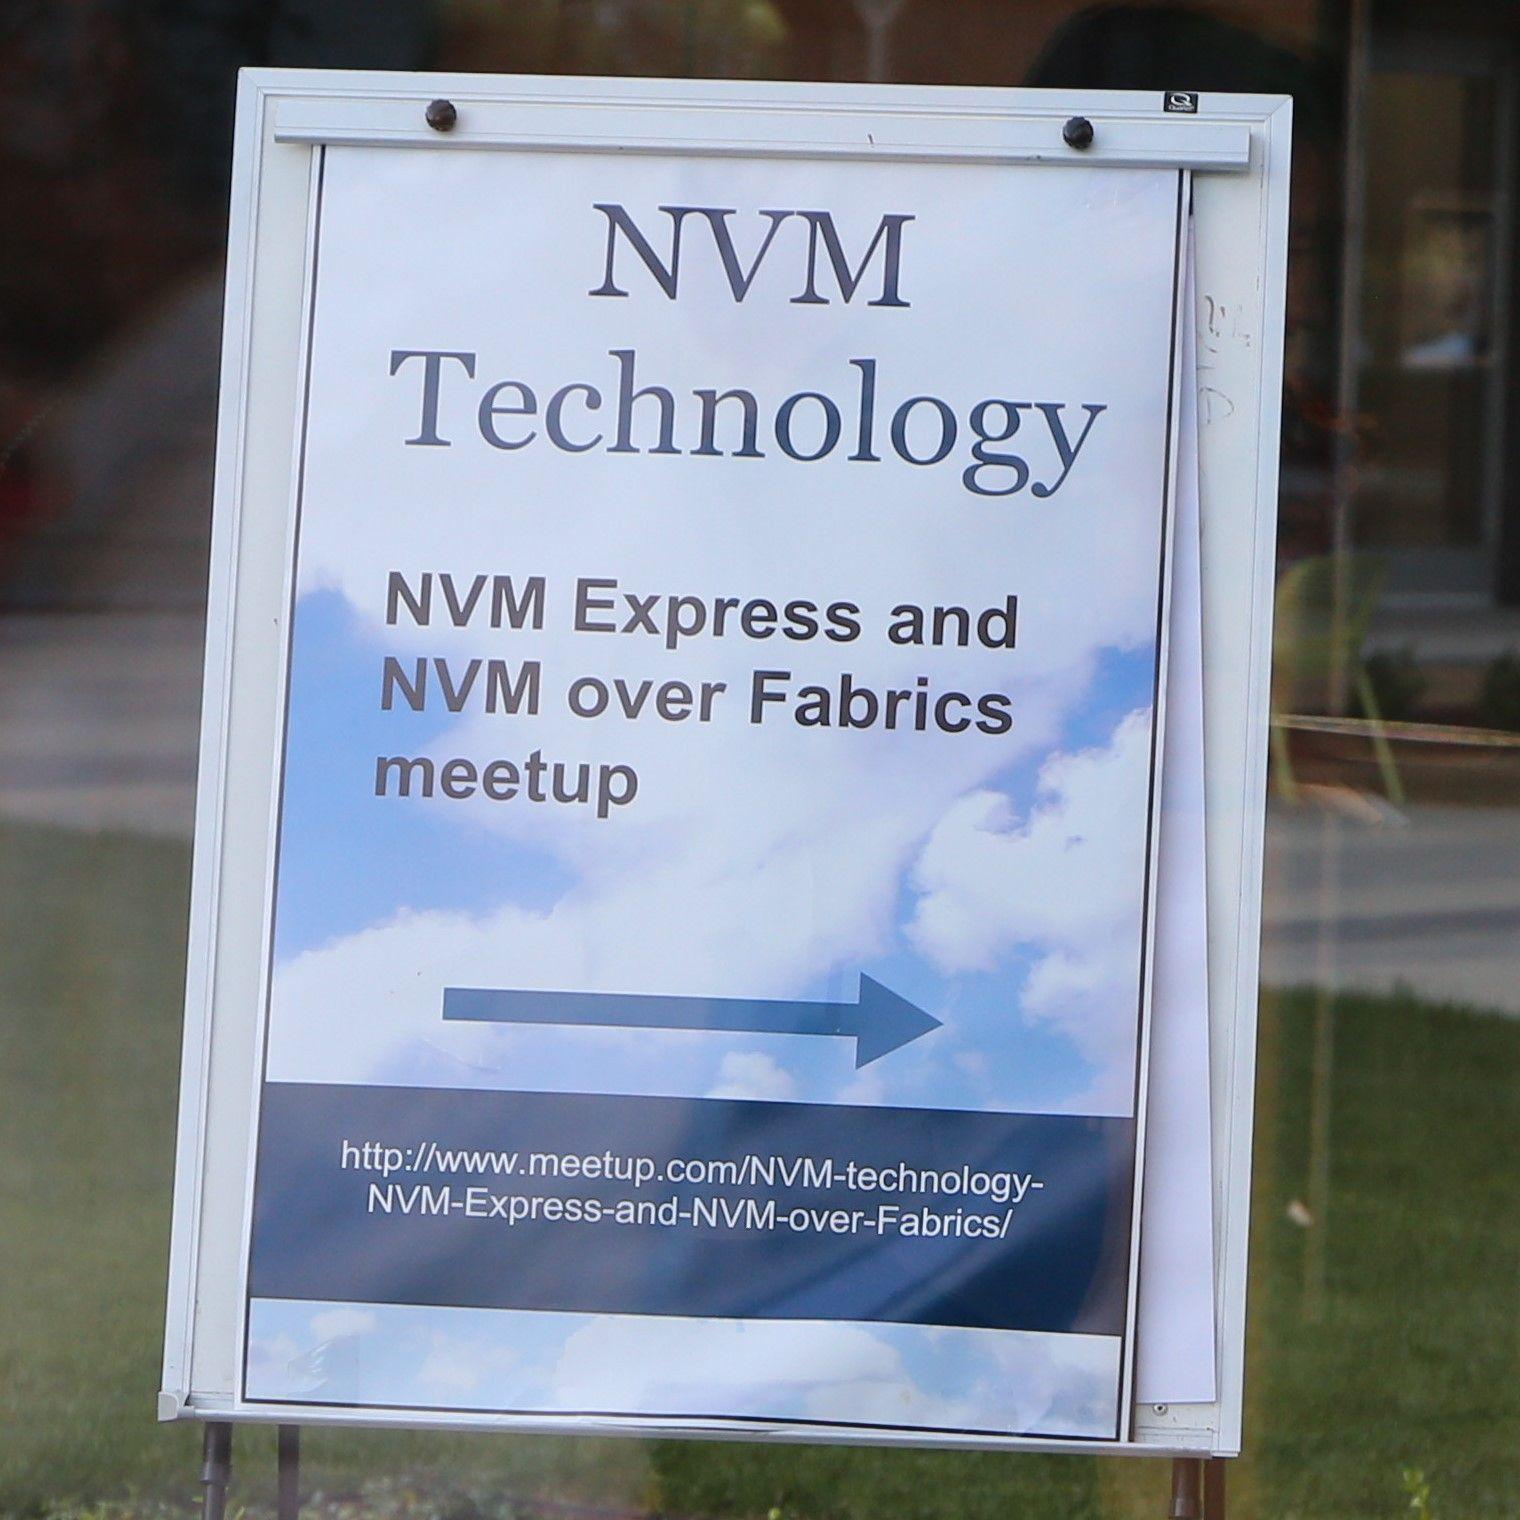 New Storage Technology- NVM Express/NVMe over Fabrics